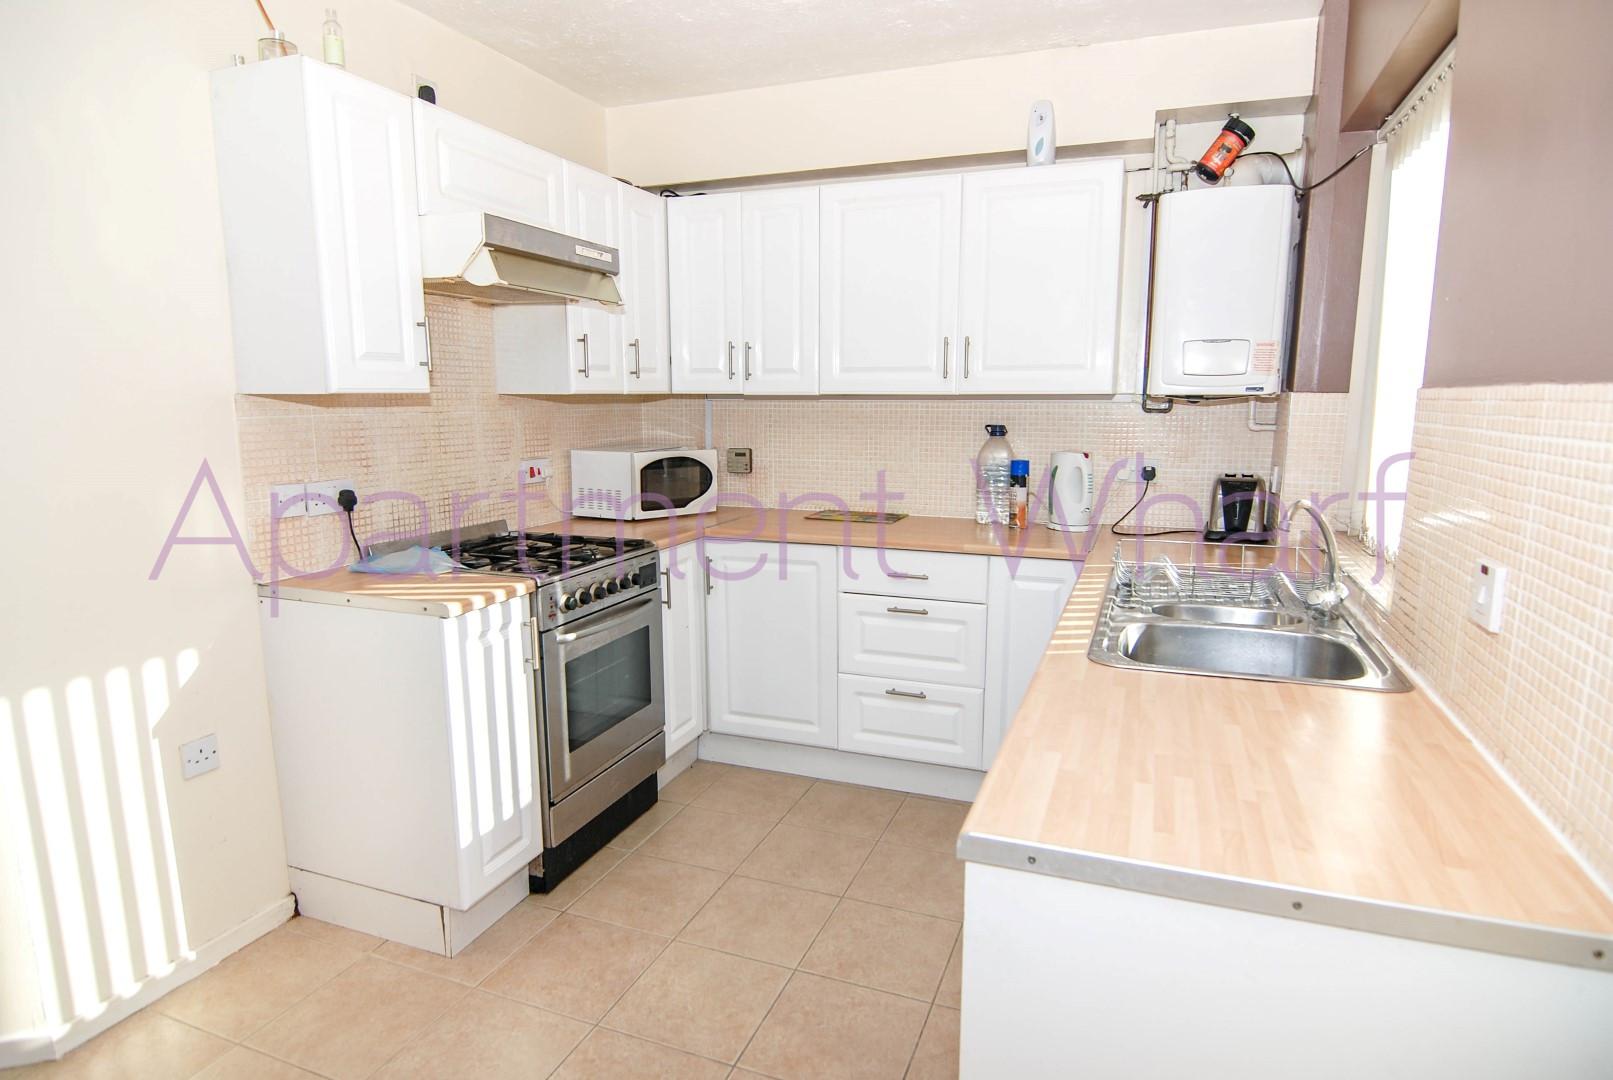 kitchen (2) (Large).jpg